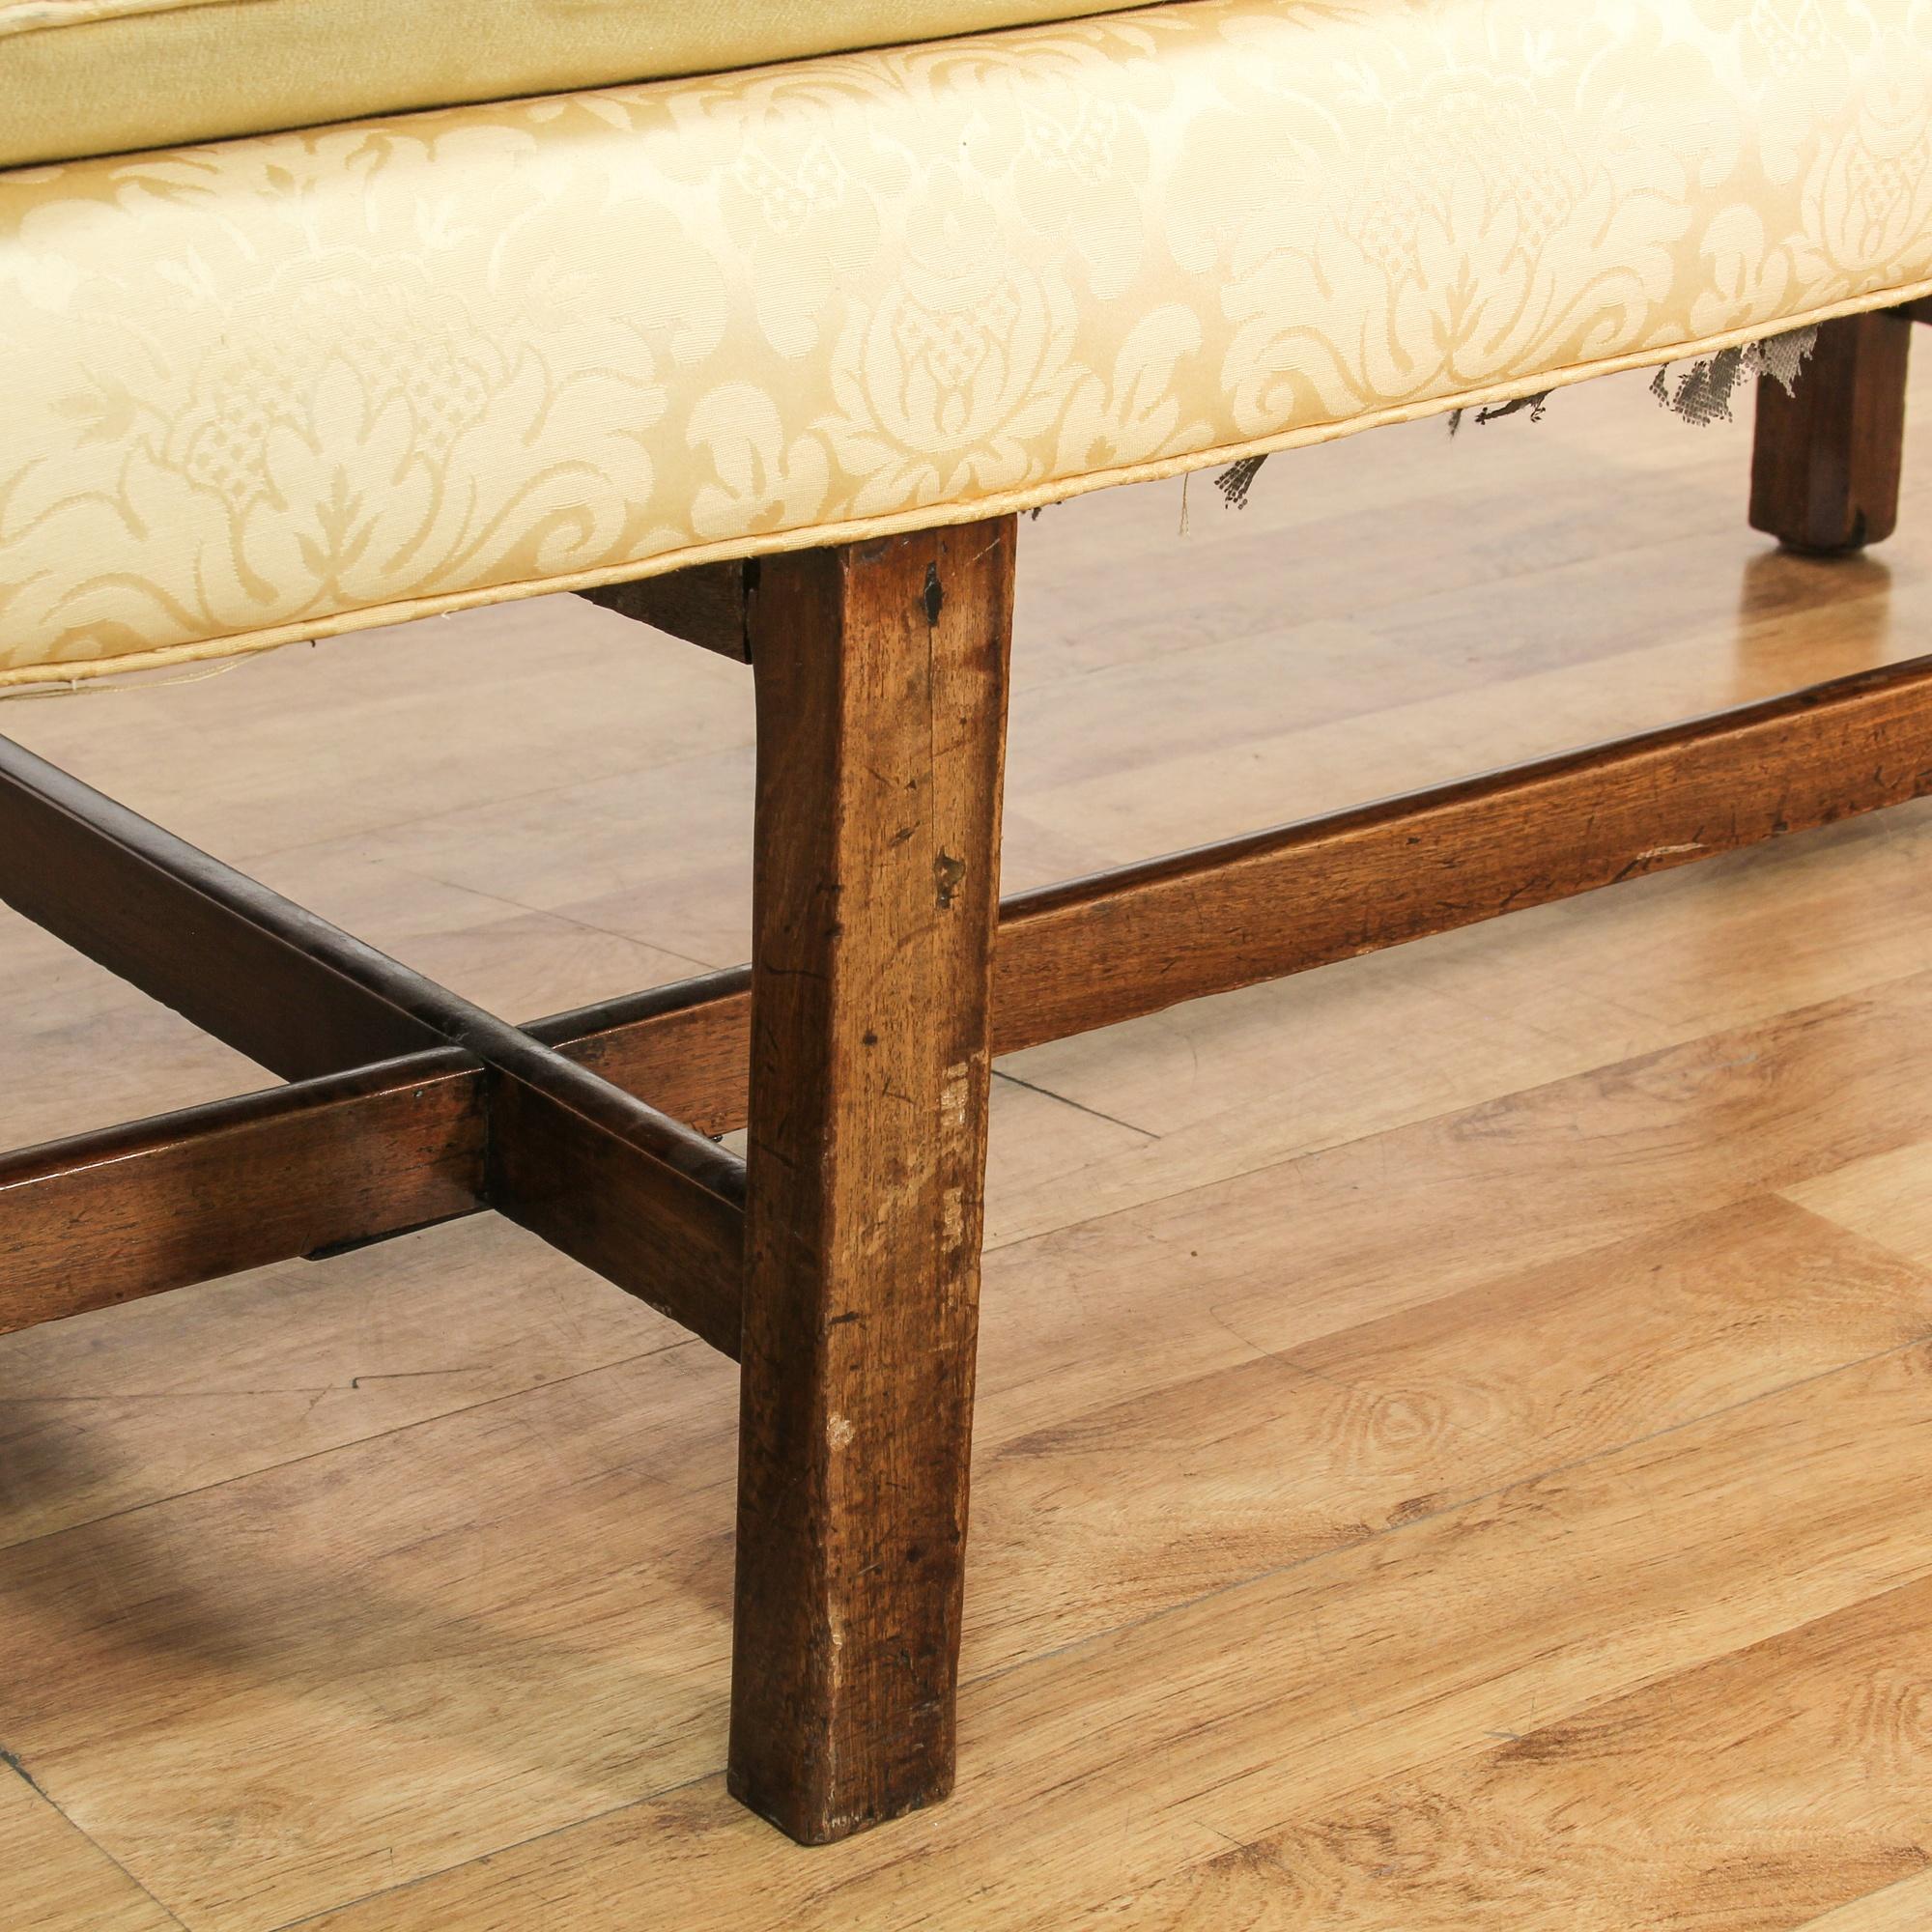 American Furniture Warehouse Desks ... Slip Covered Sofa | Loveseat Vintage Furniture San Diego & Los Angeles